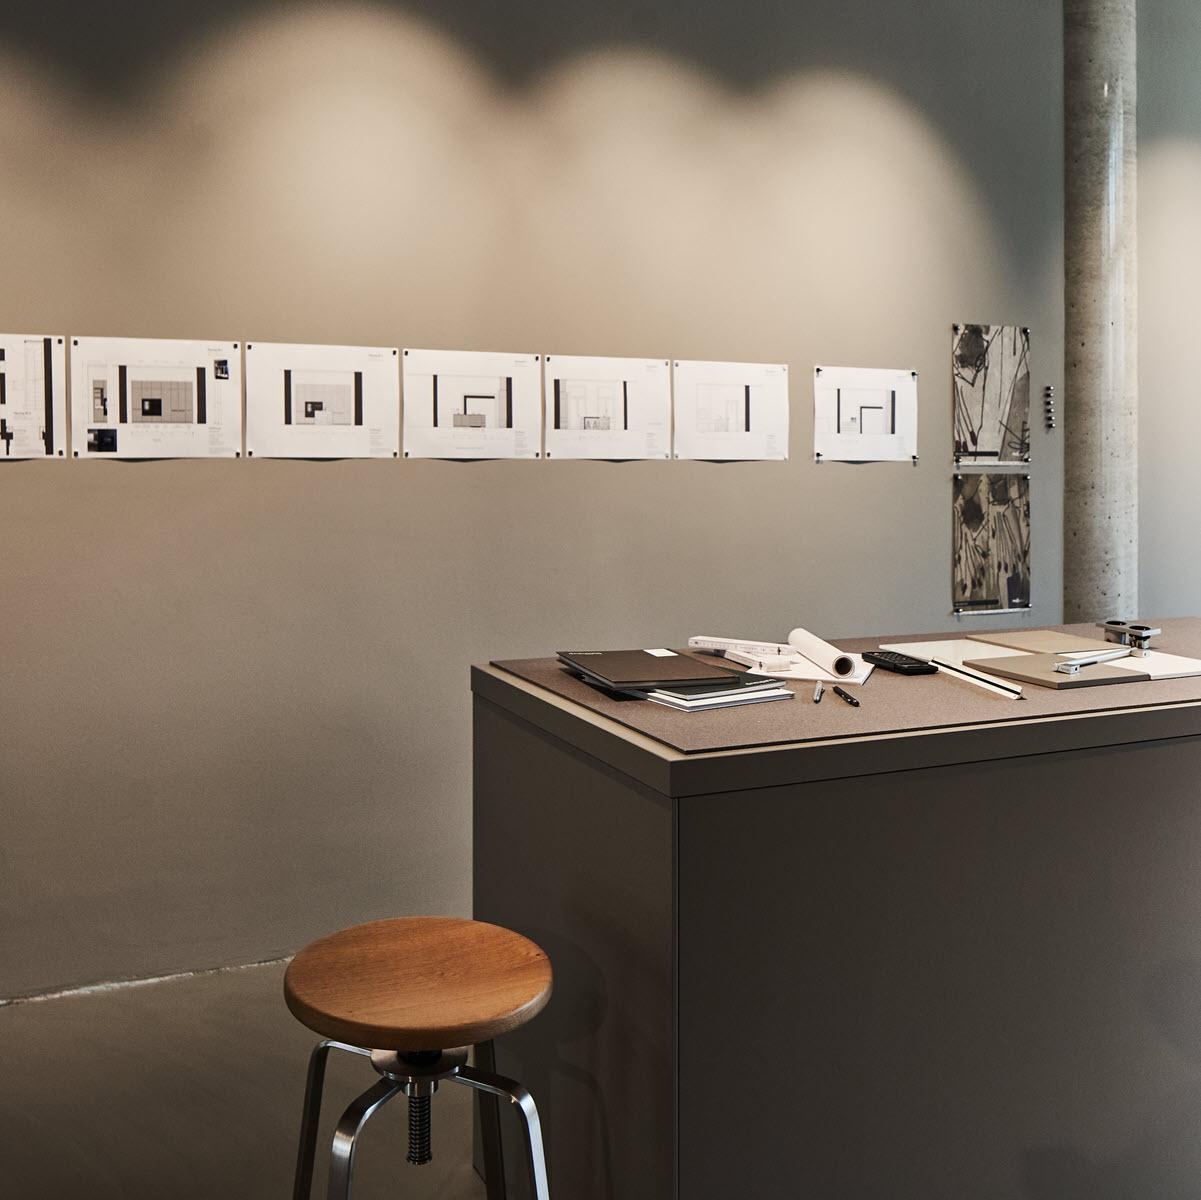 bulthaup-bonn-kuechenstudio-designfunktion-galerie-5